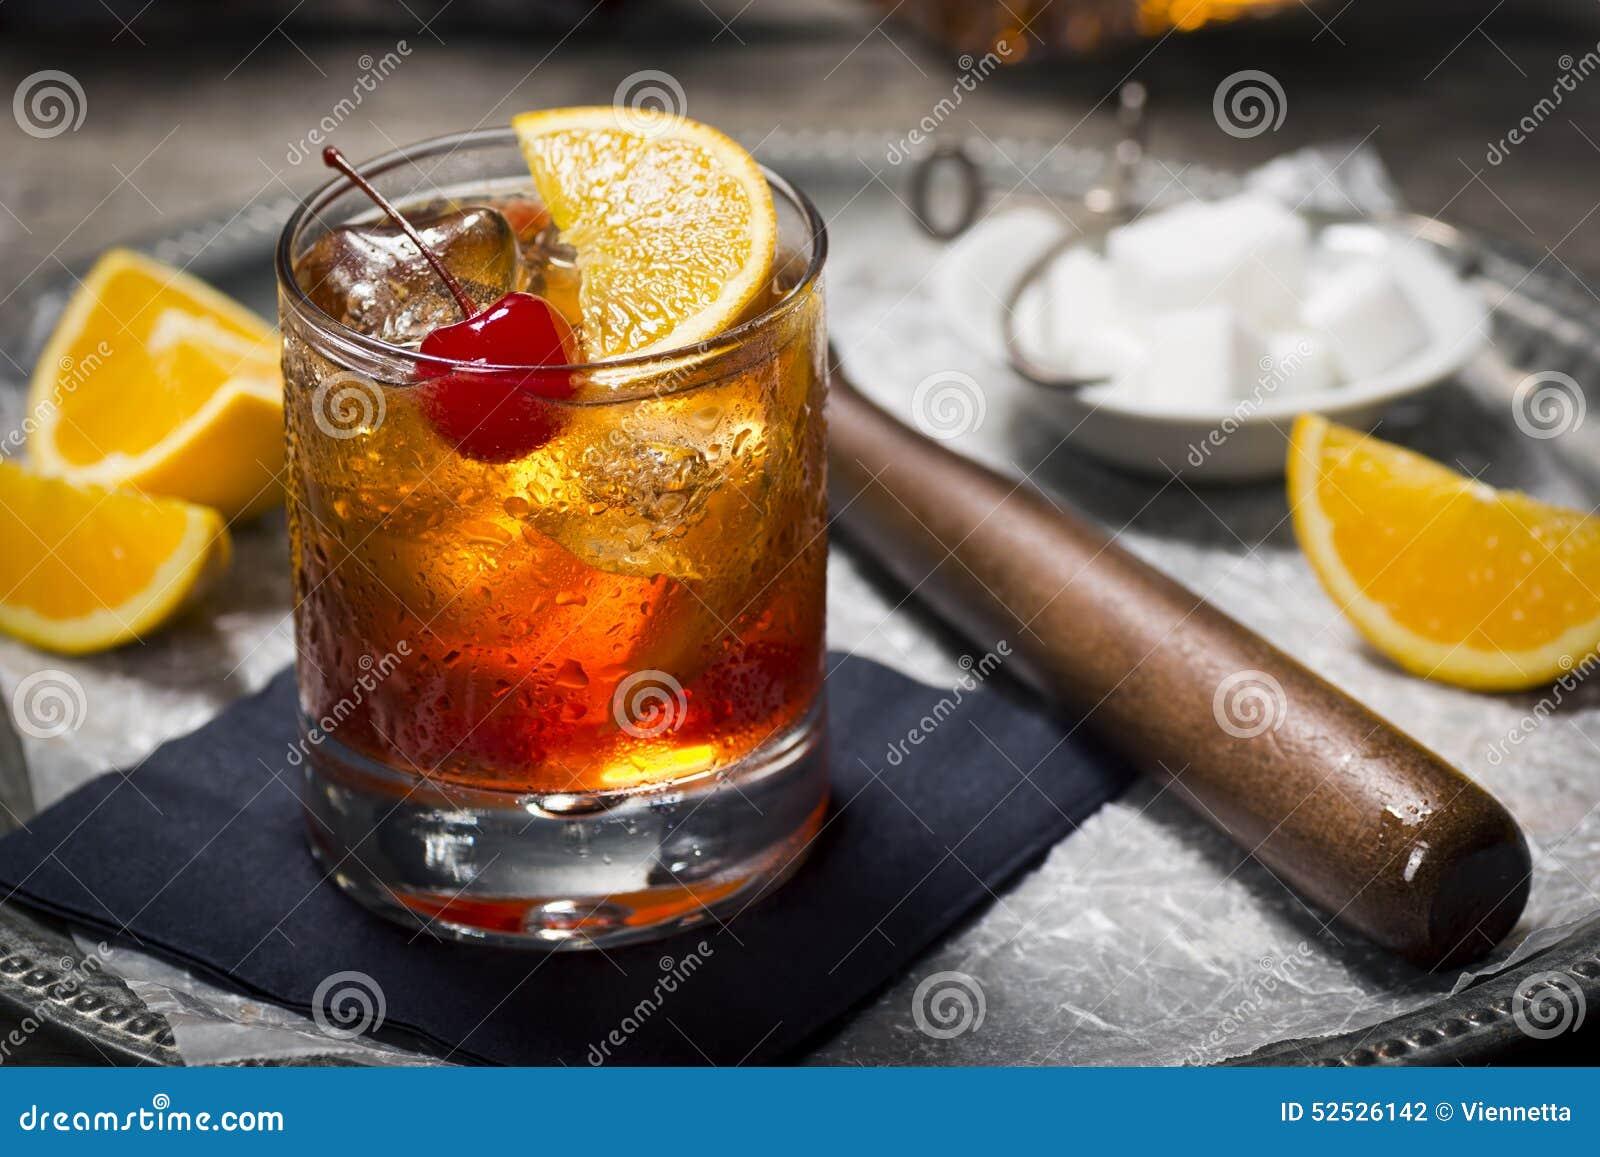 Old Fashioned - Wikipedia 40